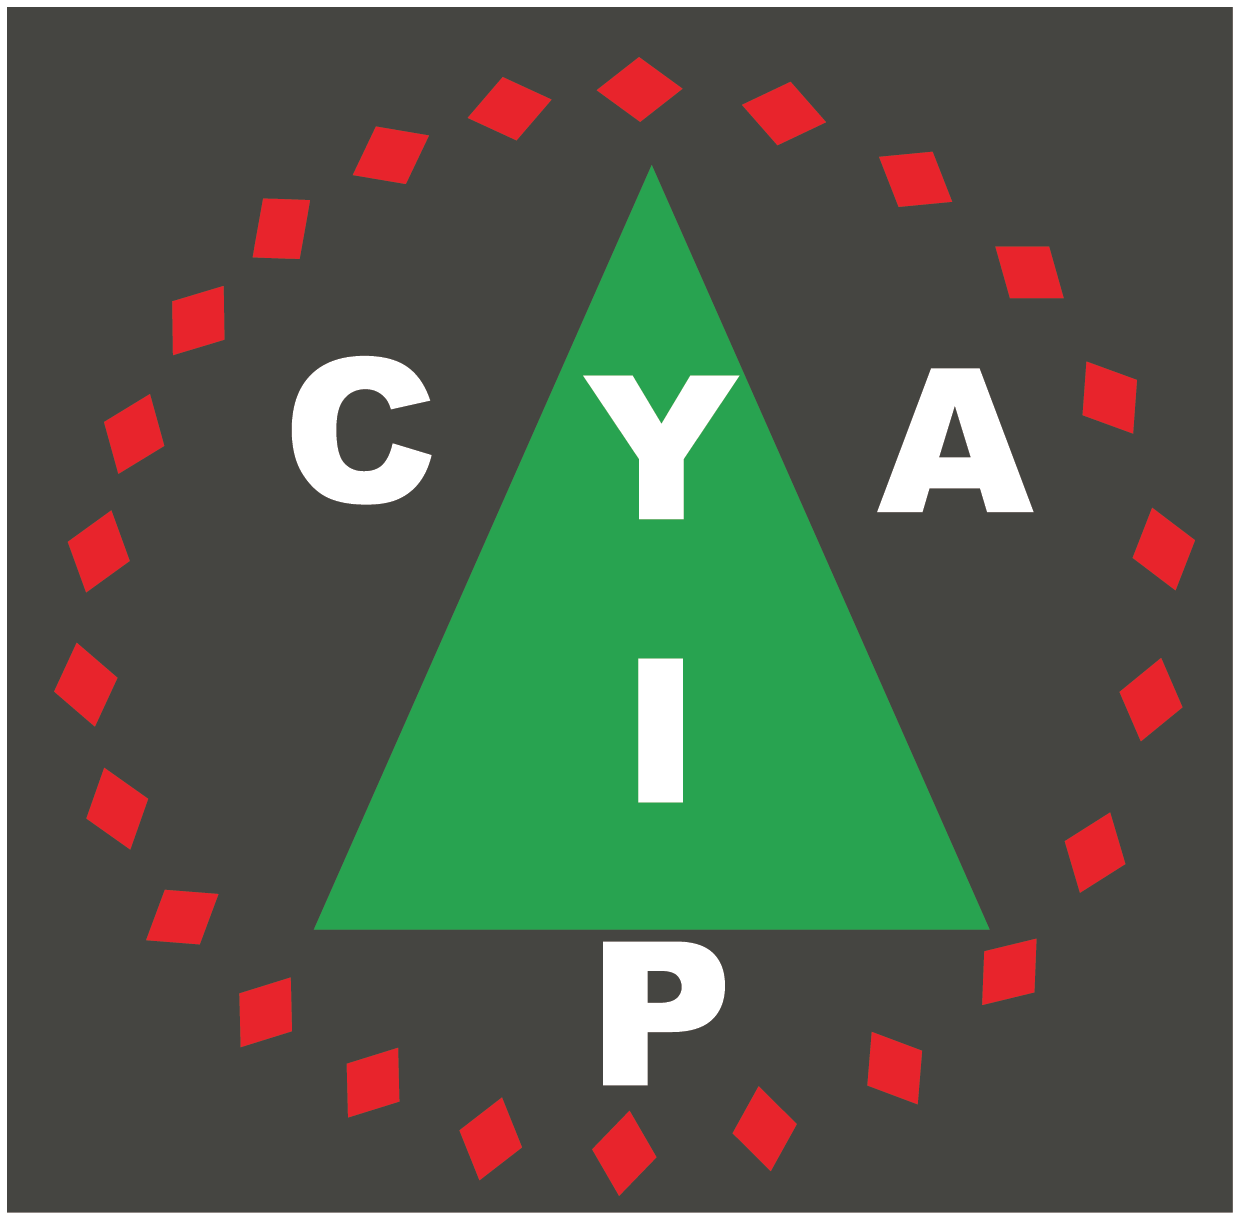 CYIAP NETWORK